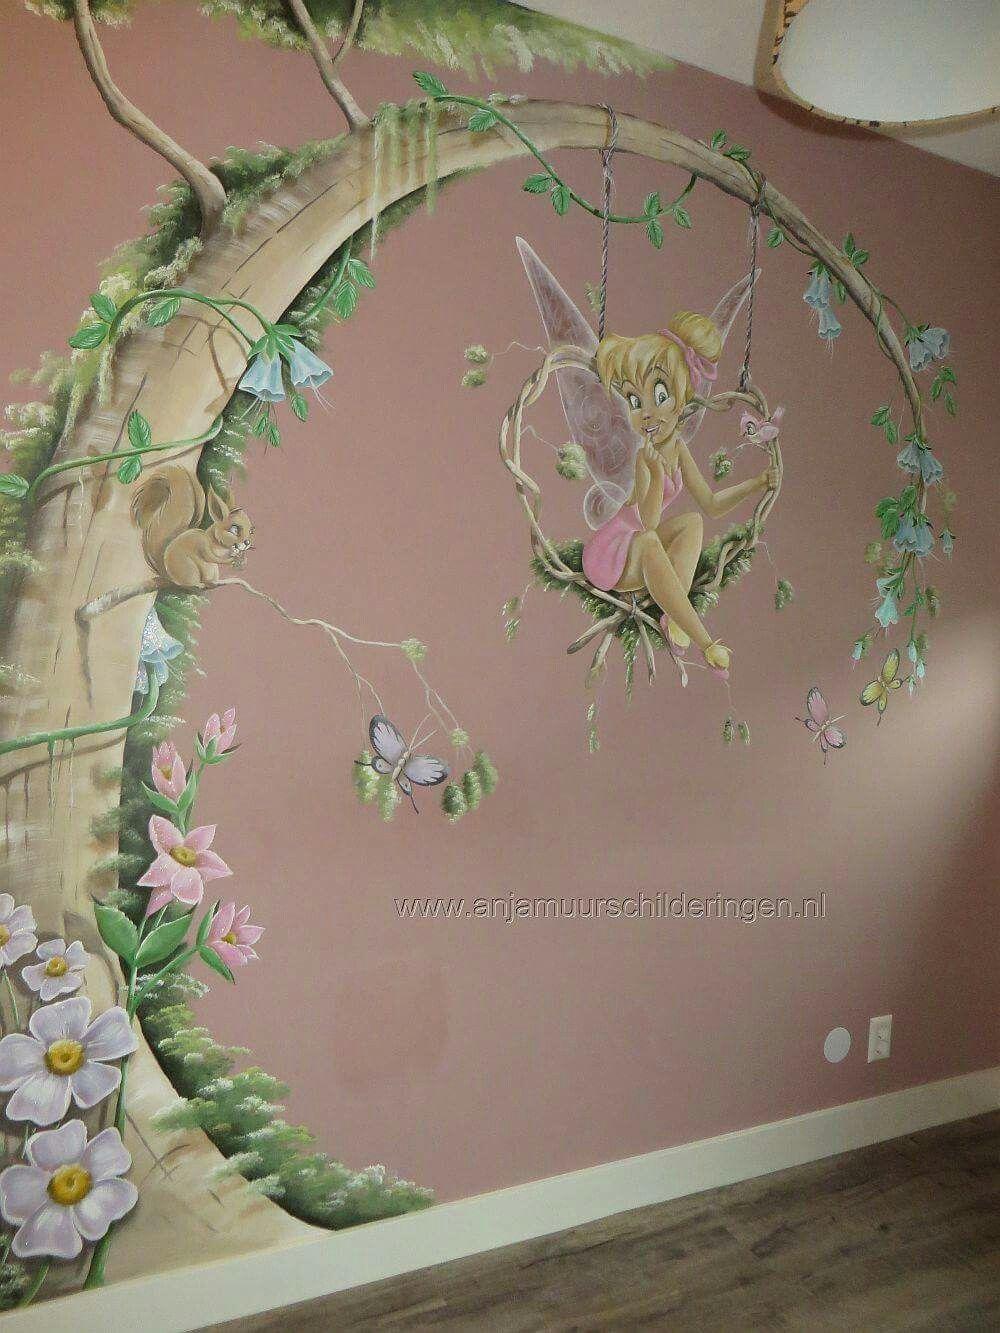 Pin de miriam zamora en decoraci n de paredes pinturas de pared decorar habitacion ni os y Paredes infantiles pintadas